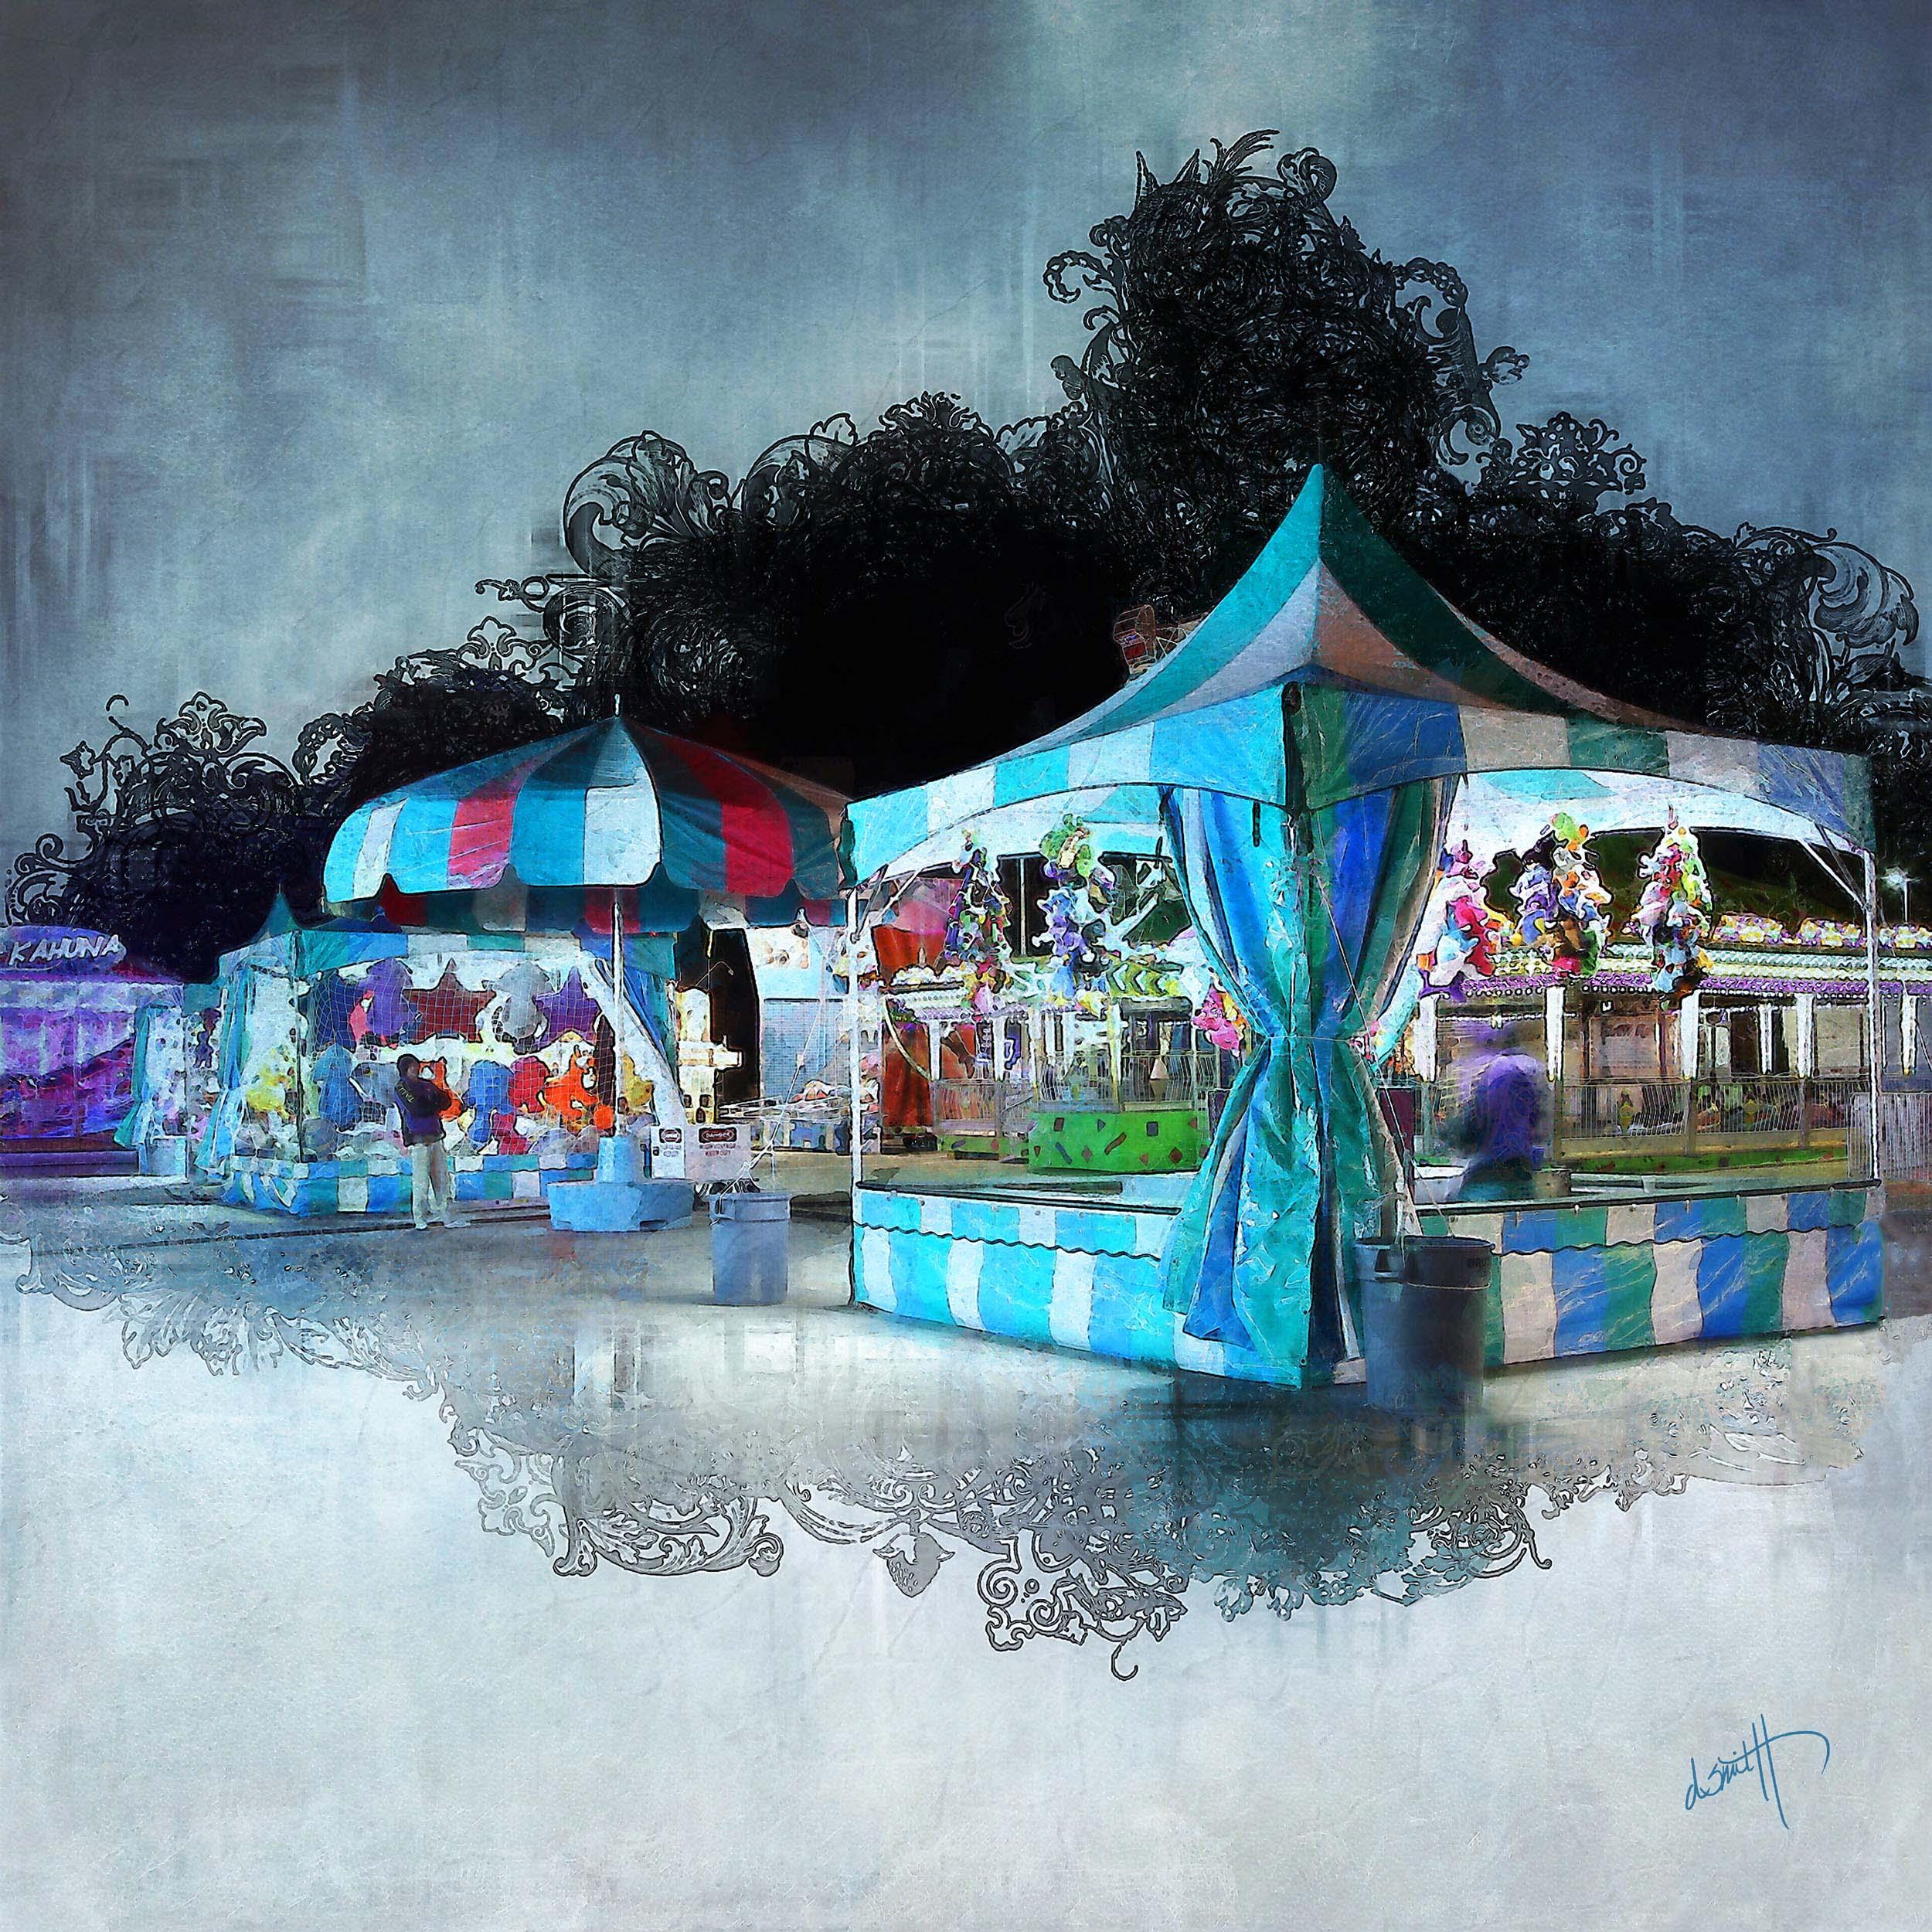 carnival-booths-denise-smith copy.jpg